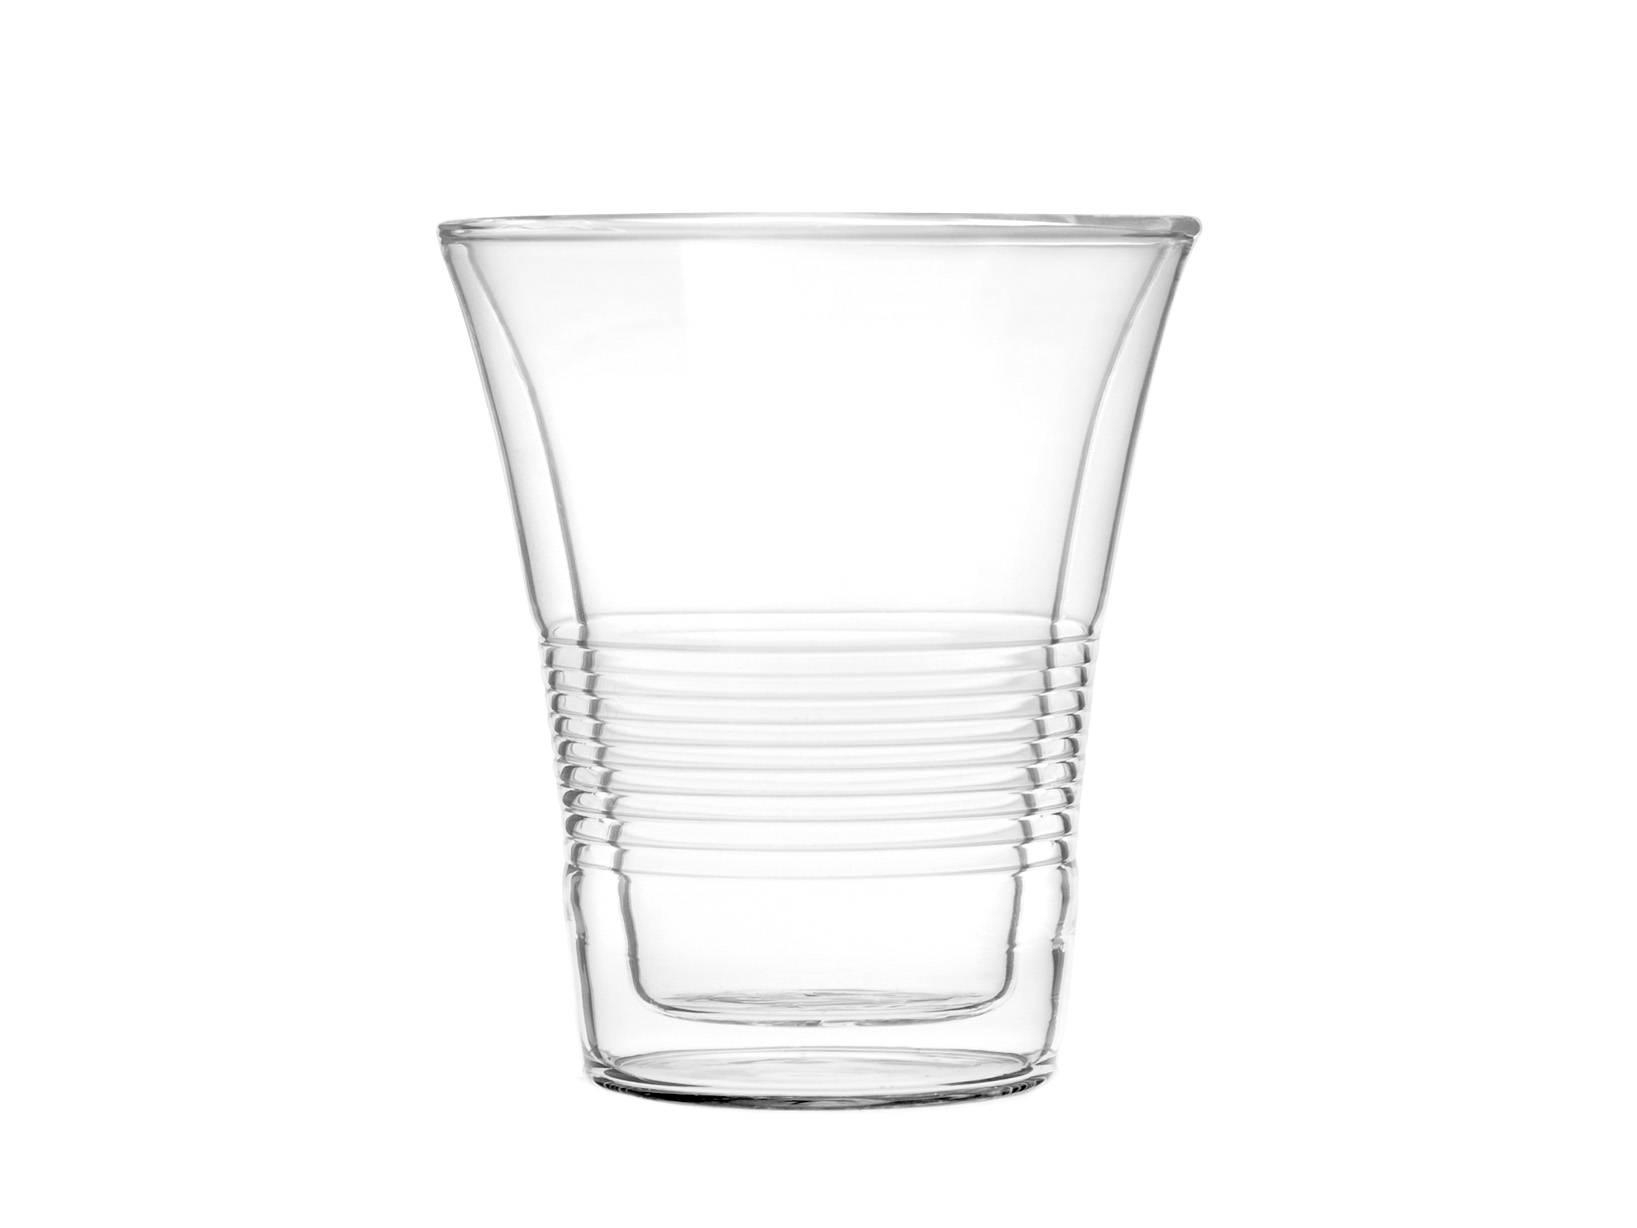 Set 2 Bicchieri Termici In Borosilicato, 220 Ml, Trasparente